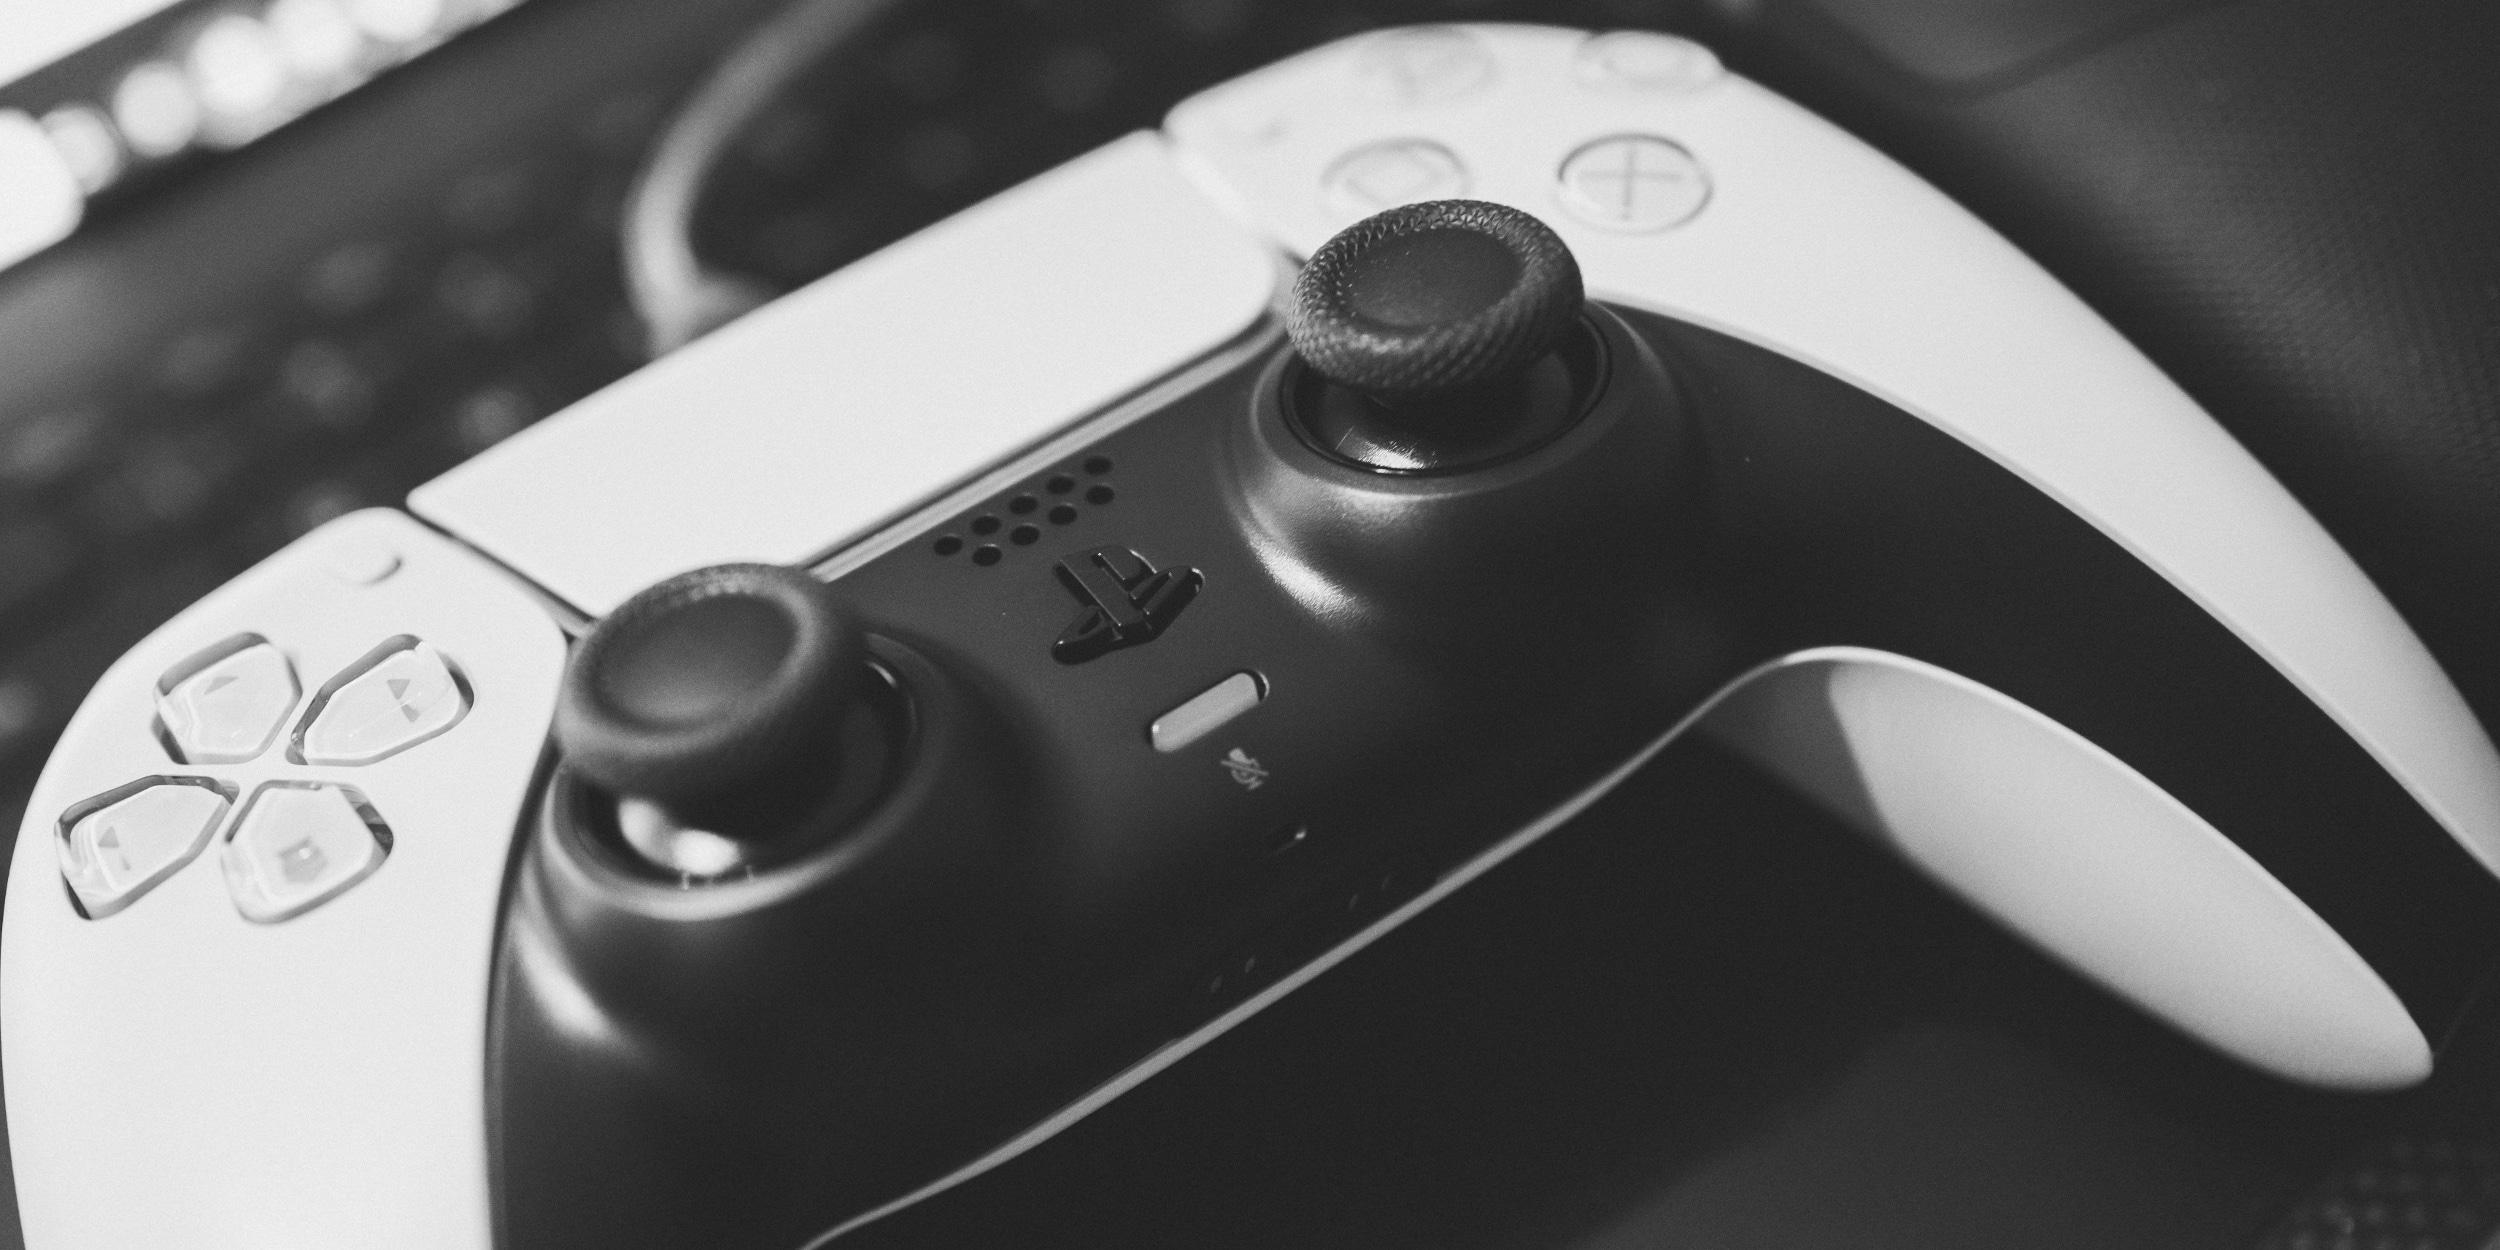 a closeup on a Playstation 5 controller